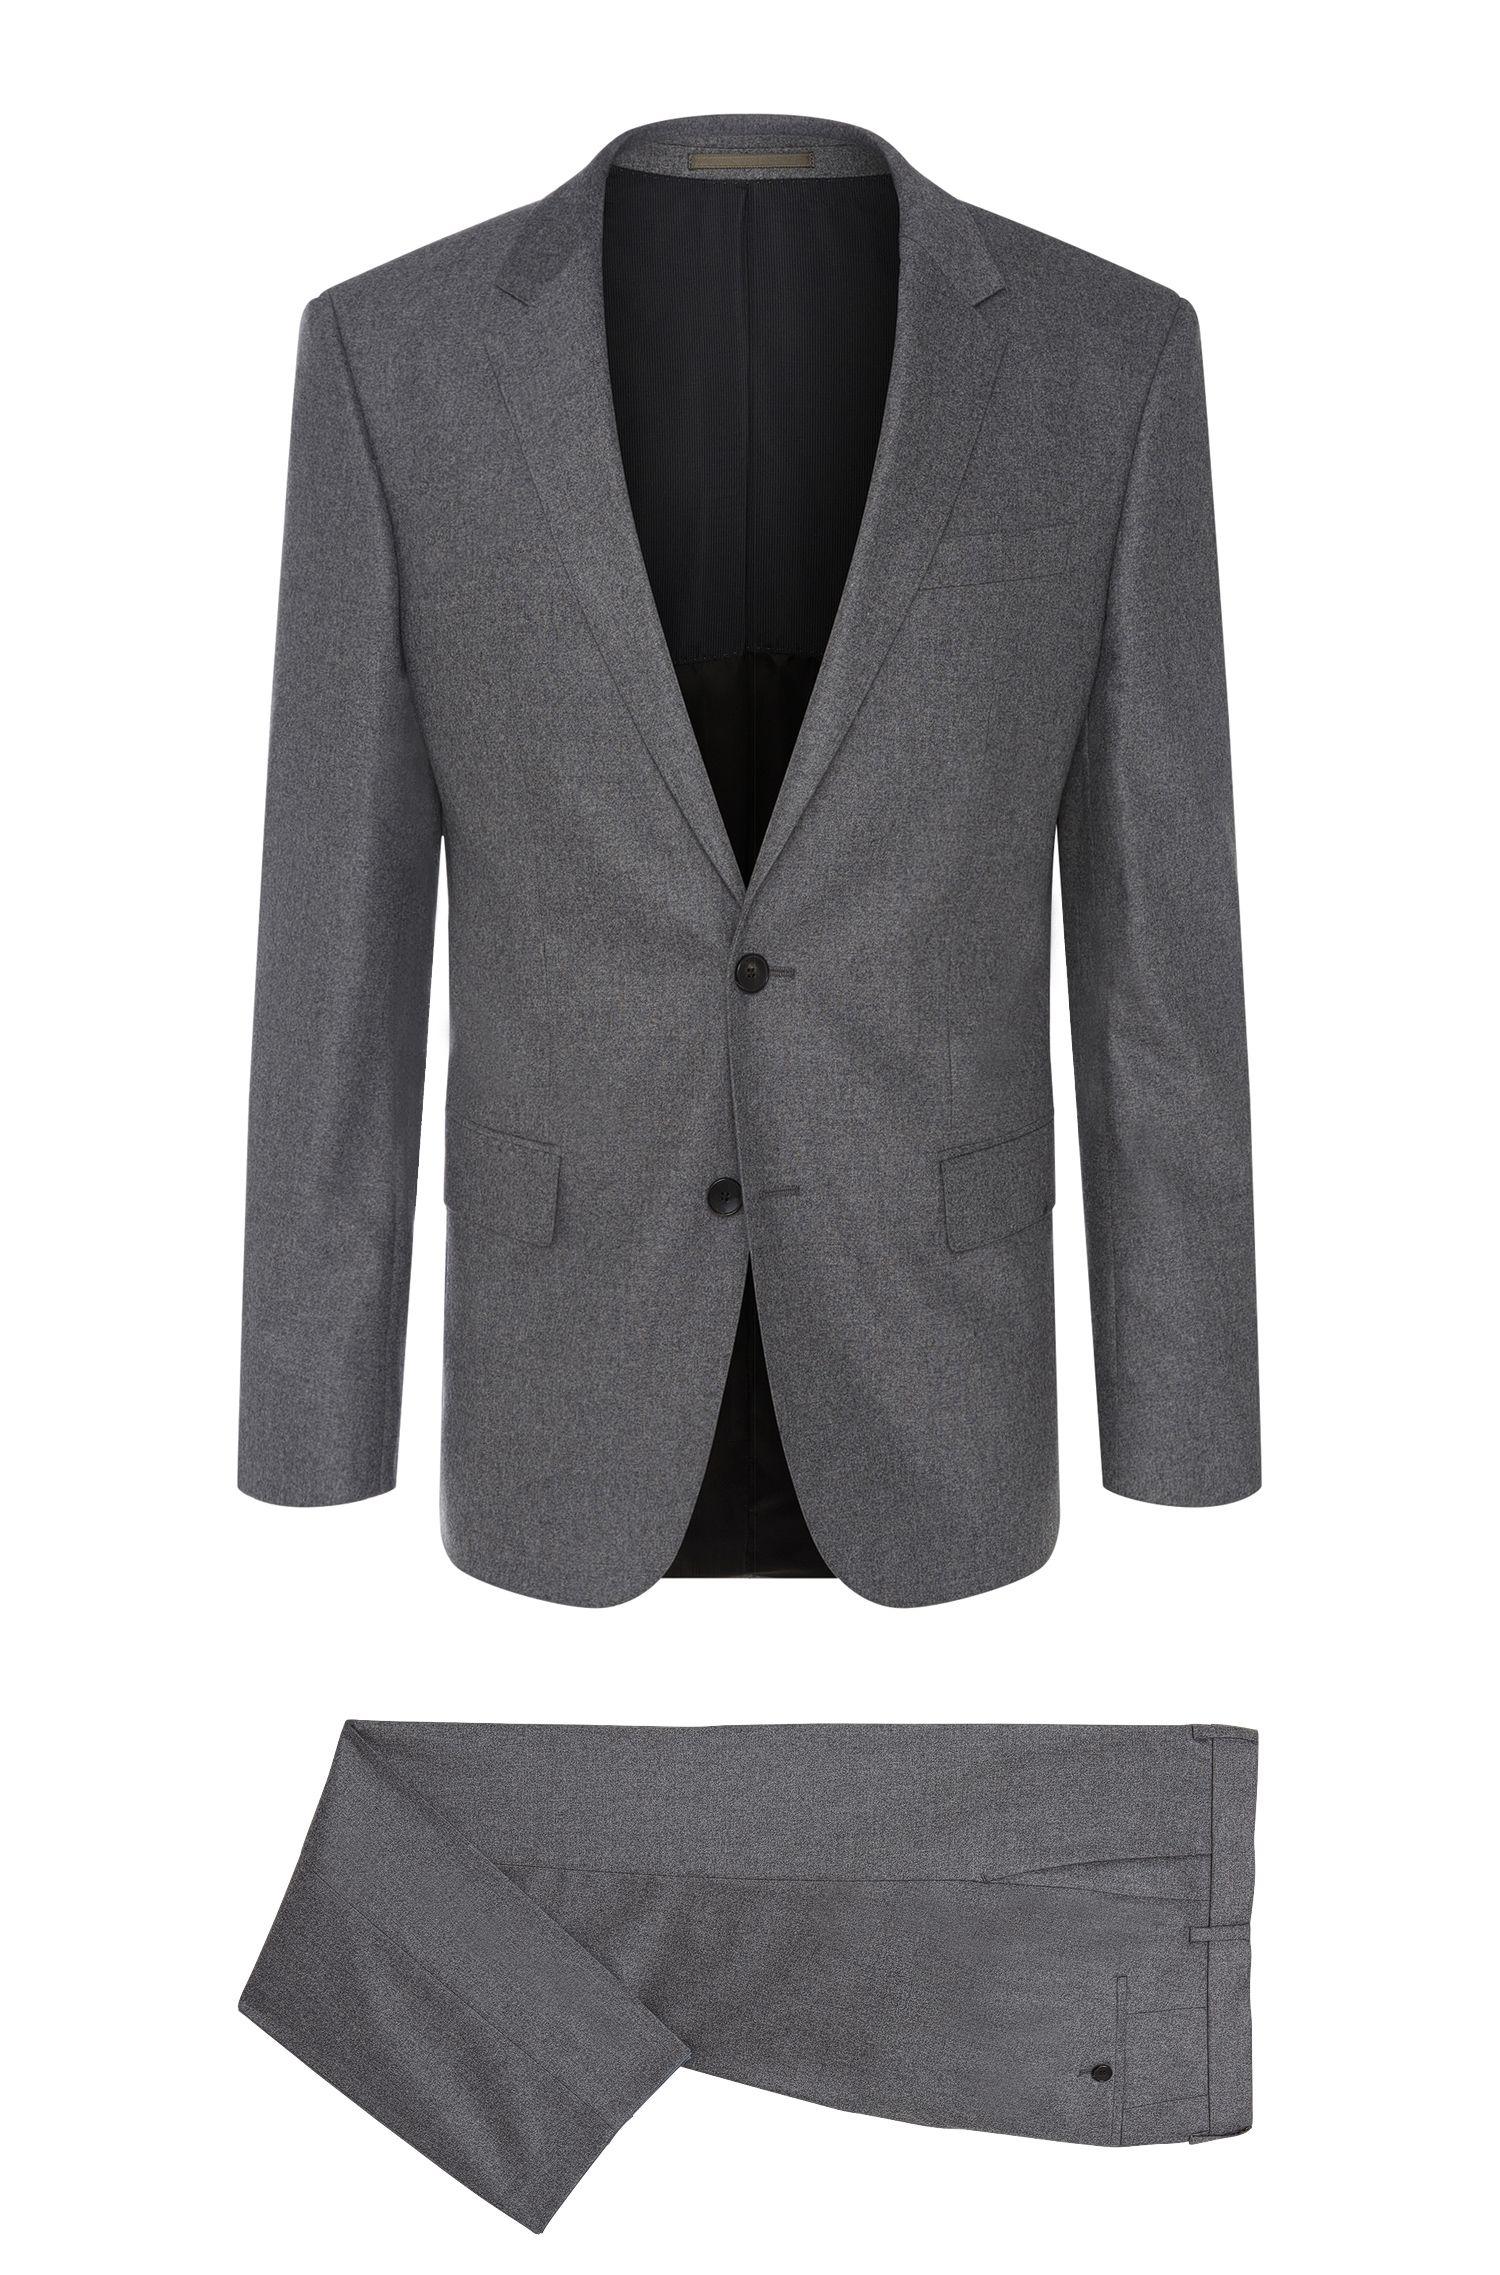 'Huge/Genius' | Slim Fit,  Italian Stretch Virgin Wool Cashmere Suit